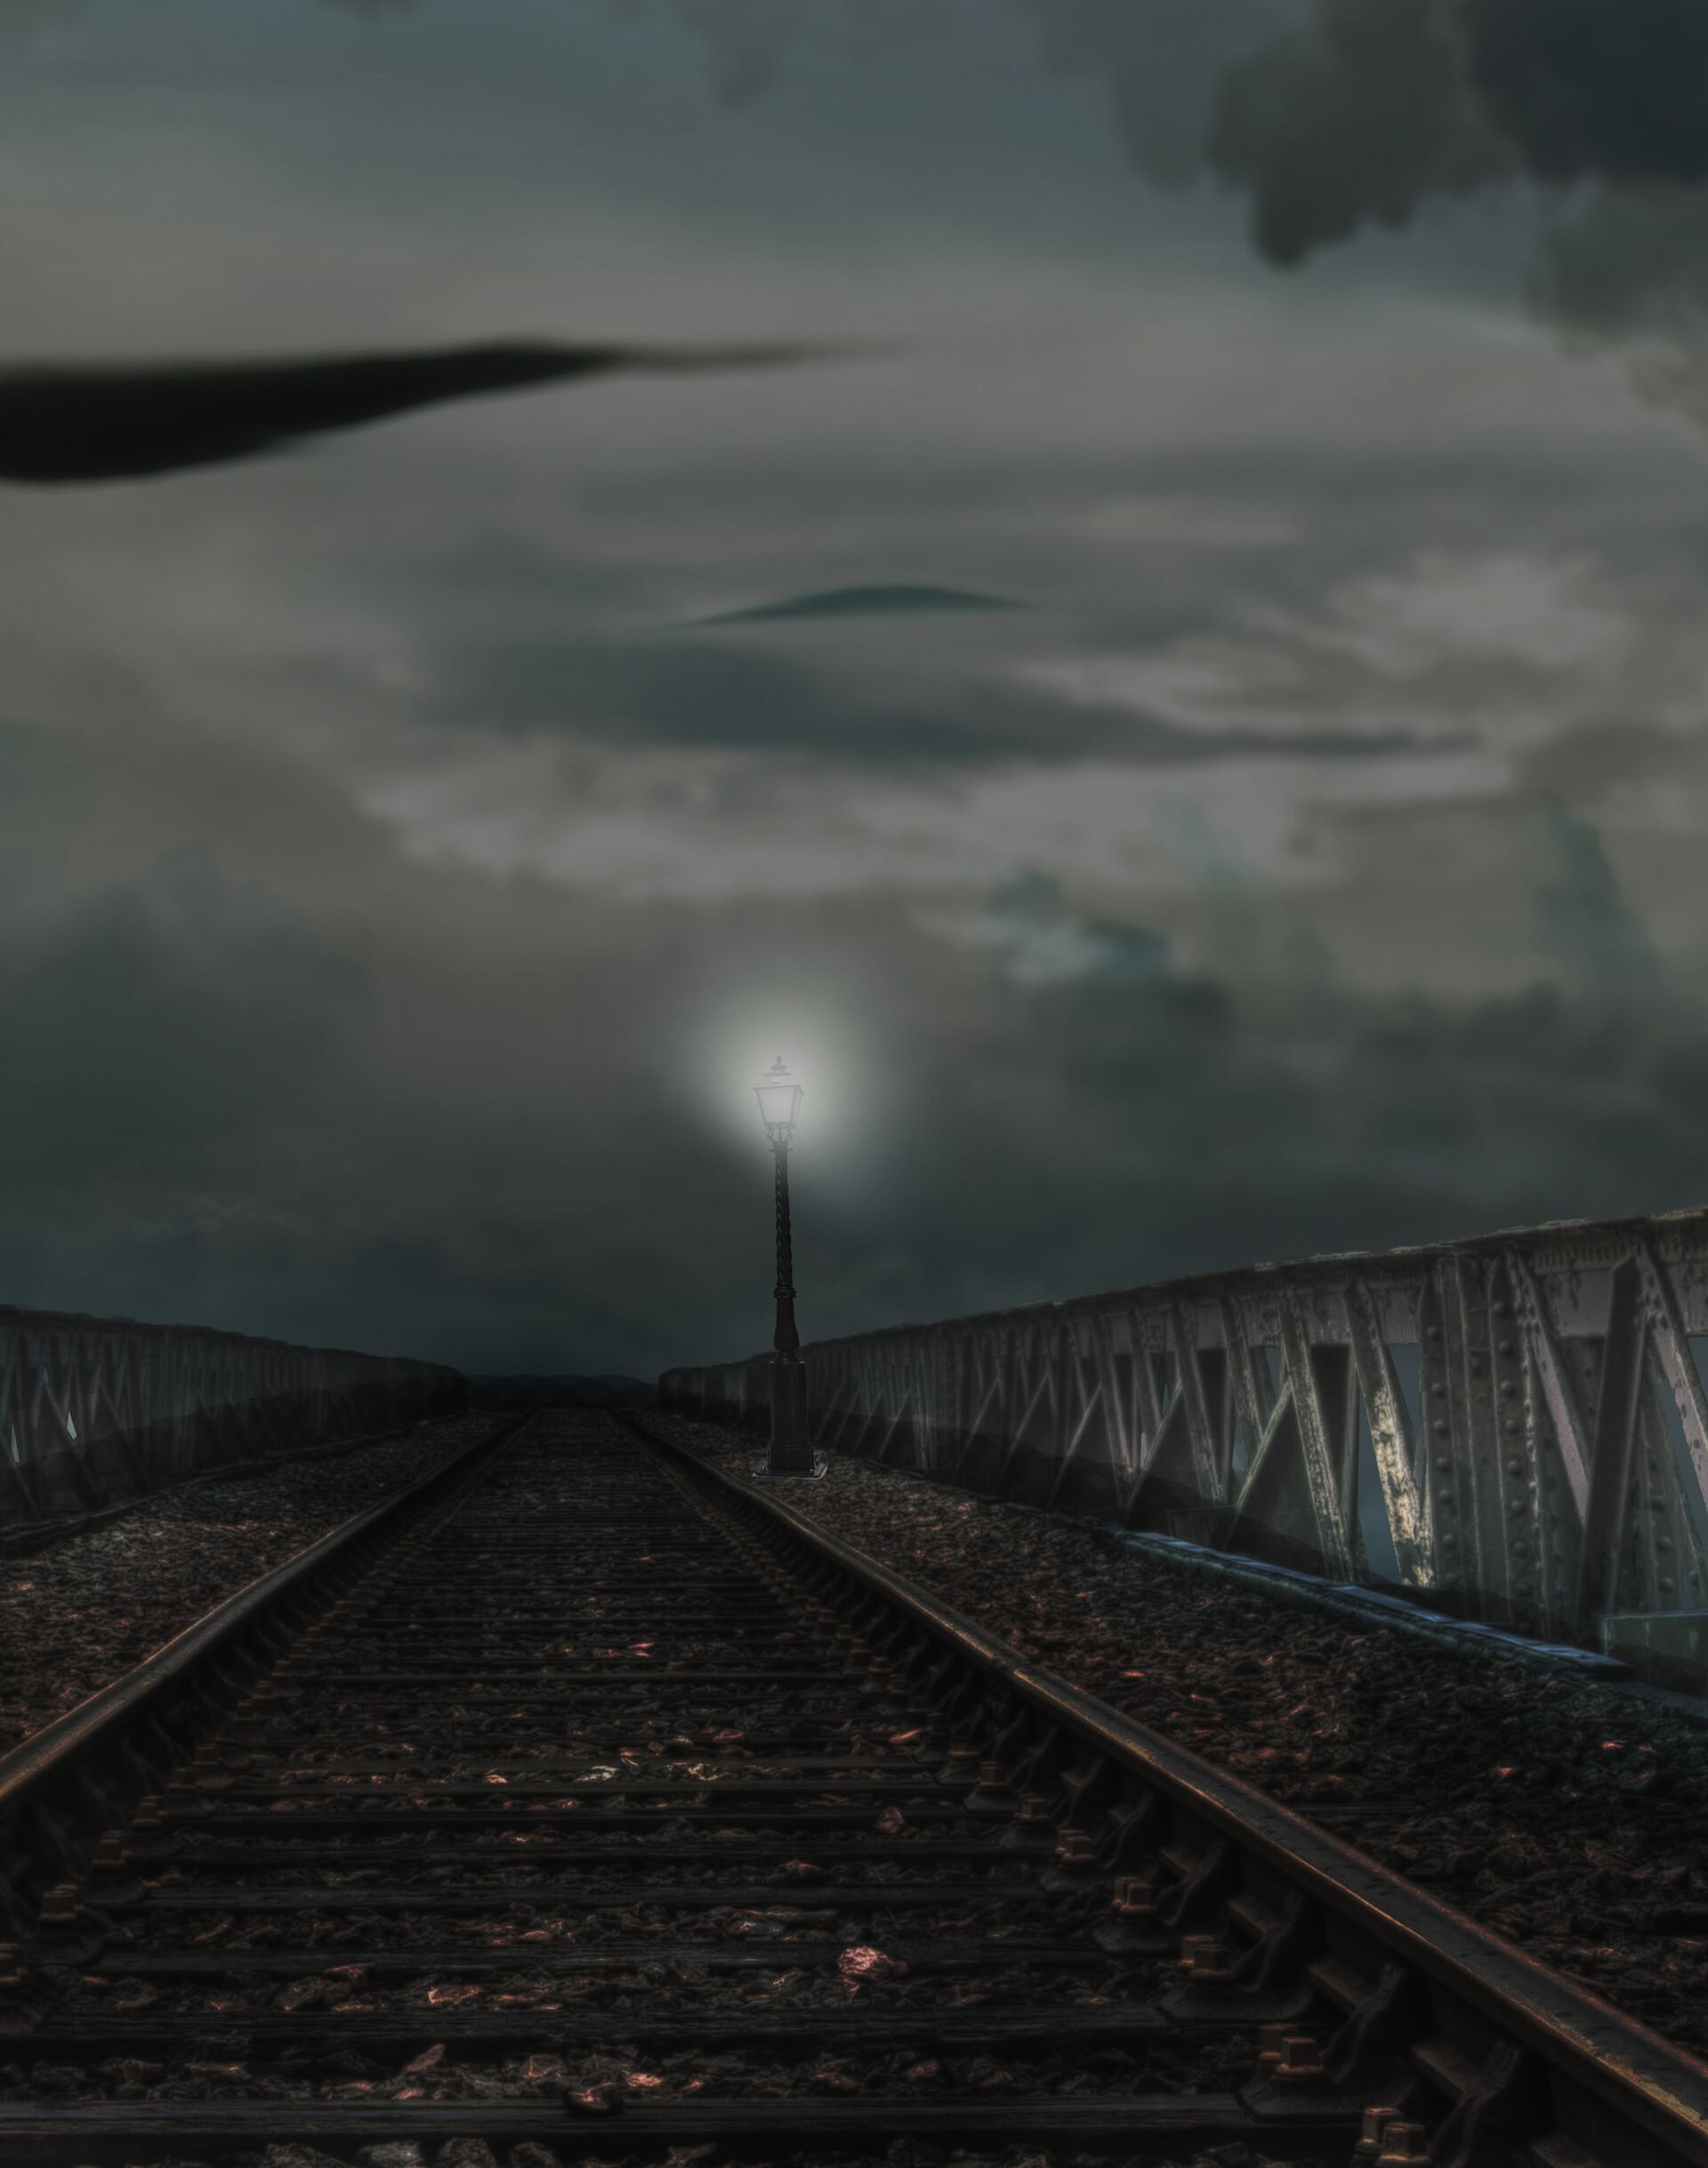 Randall mcnair tracks2 1